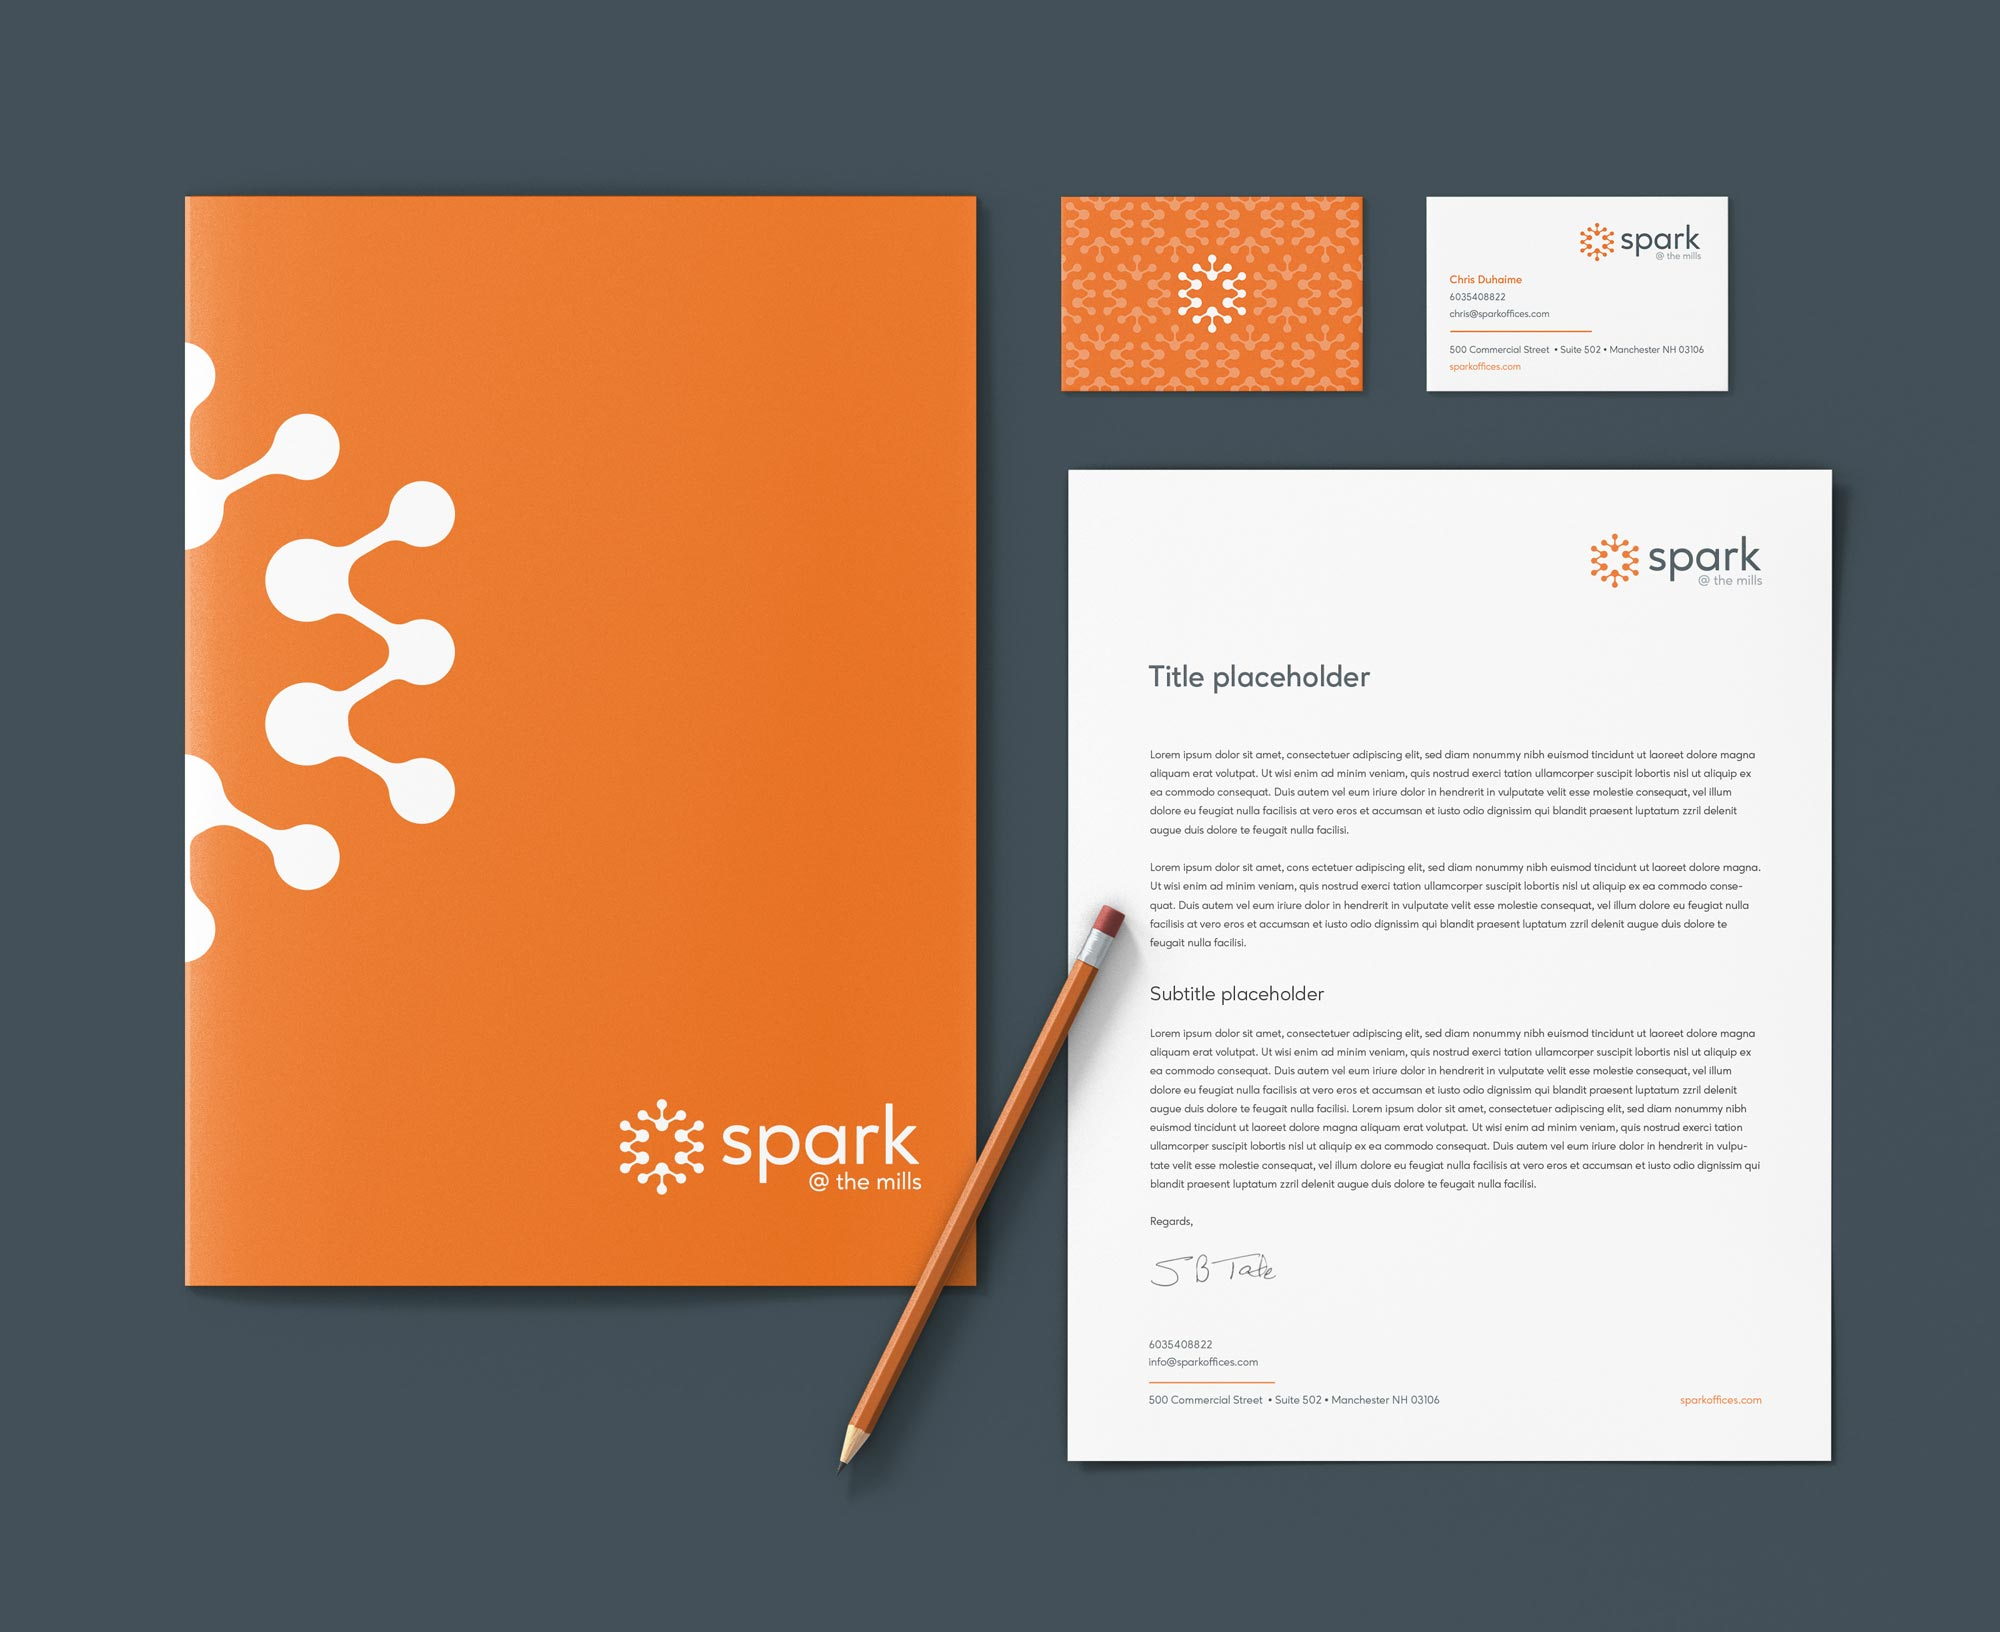 Spark brand id2